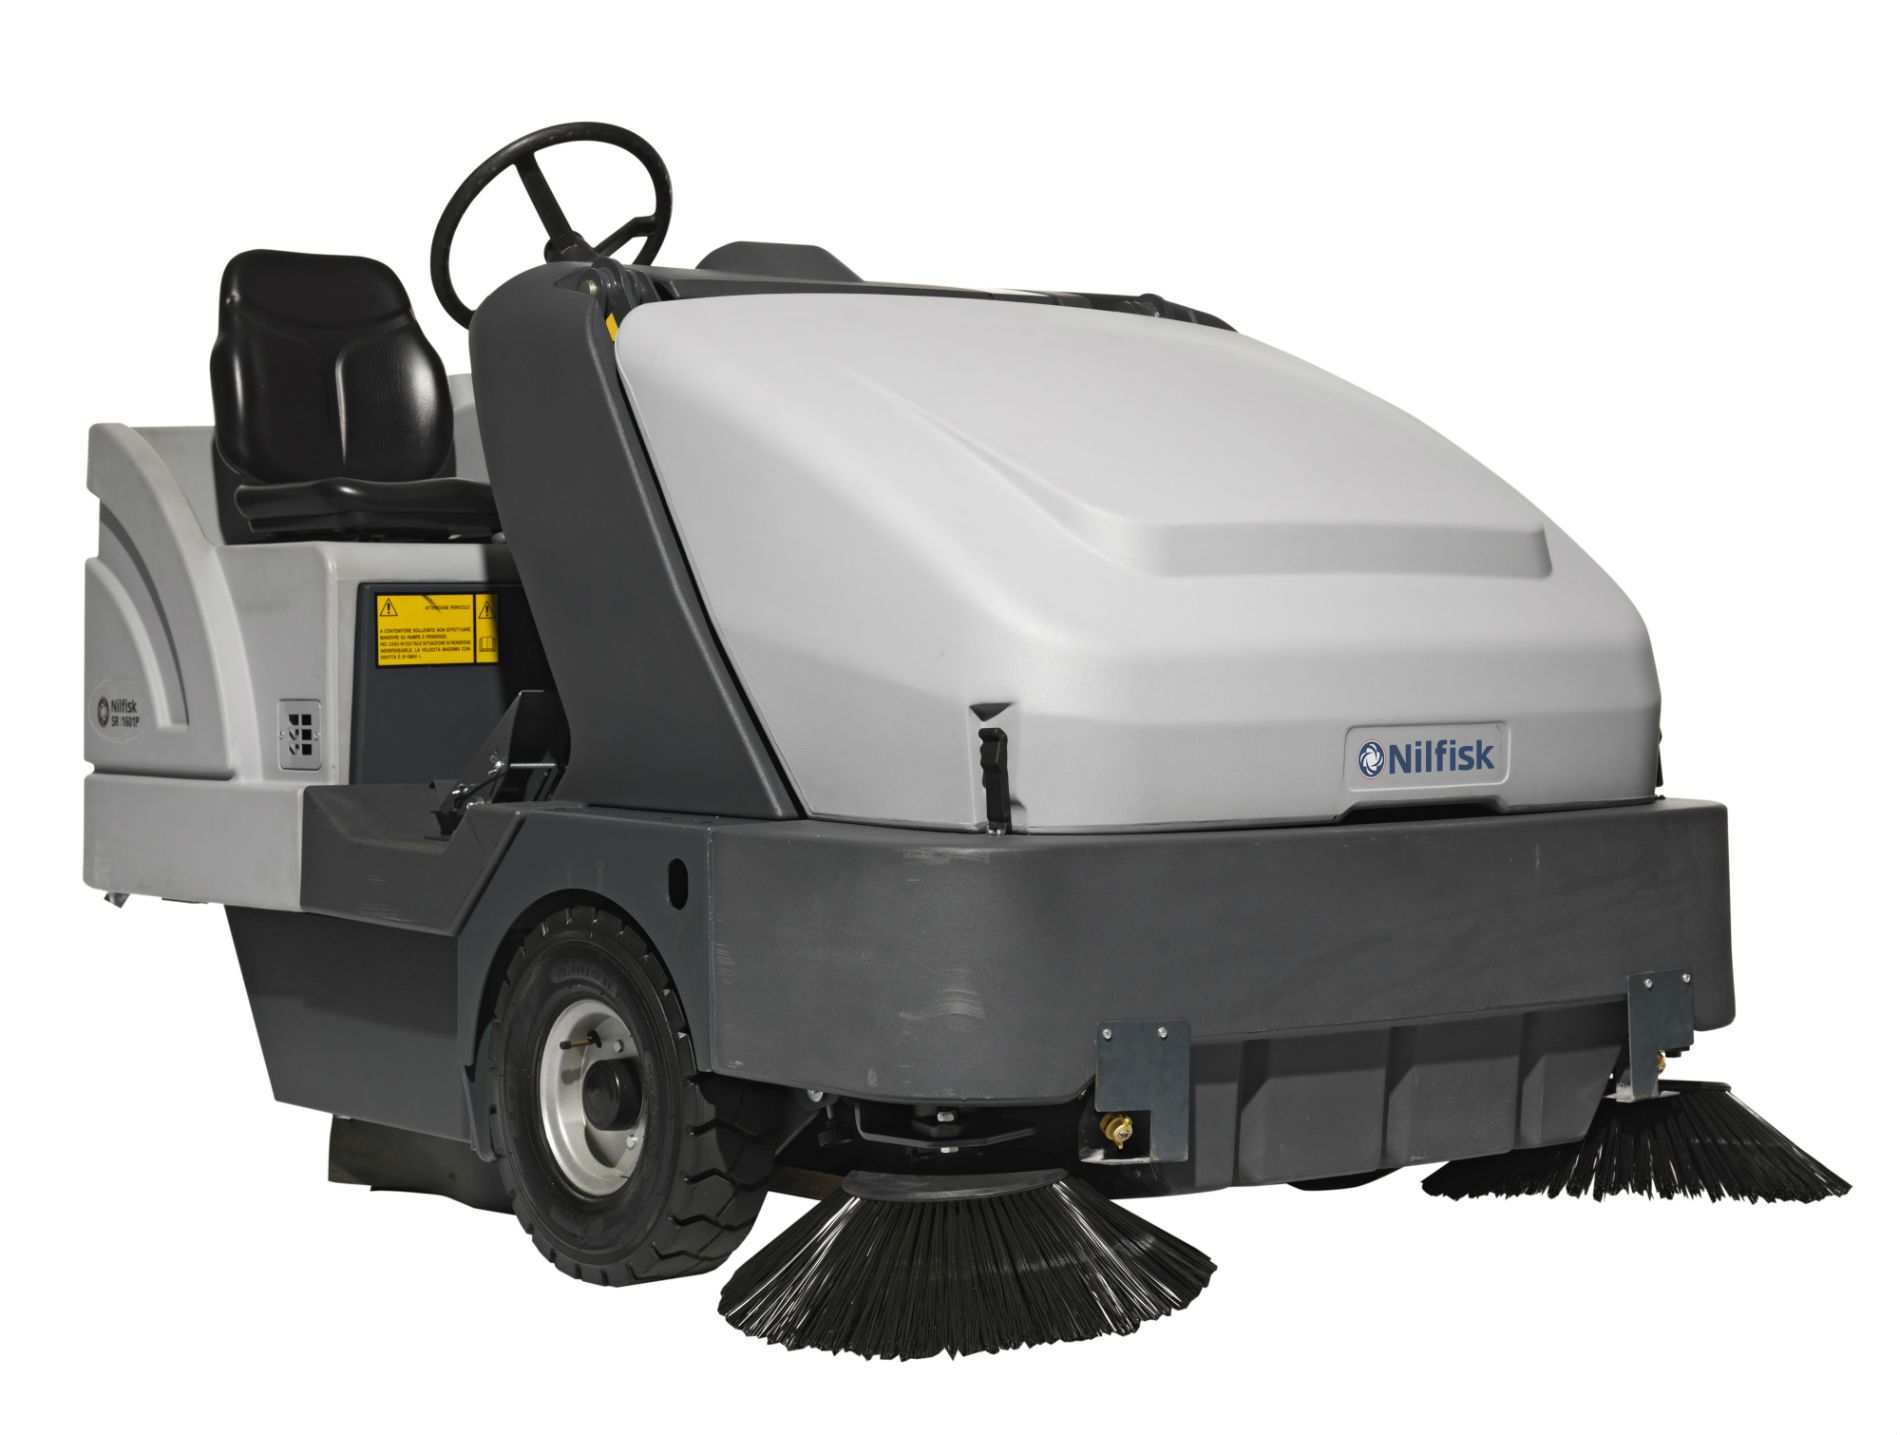 Nilfisk SR1601 Sweeper